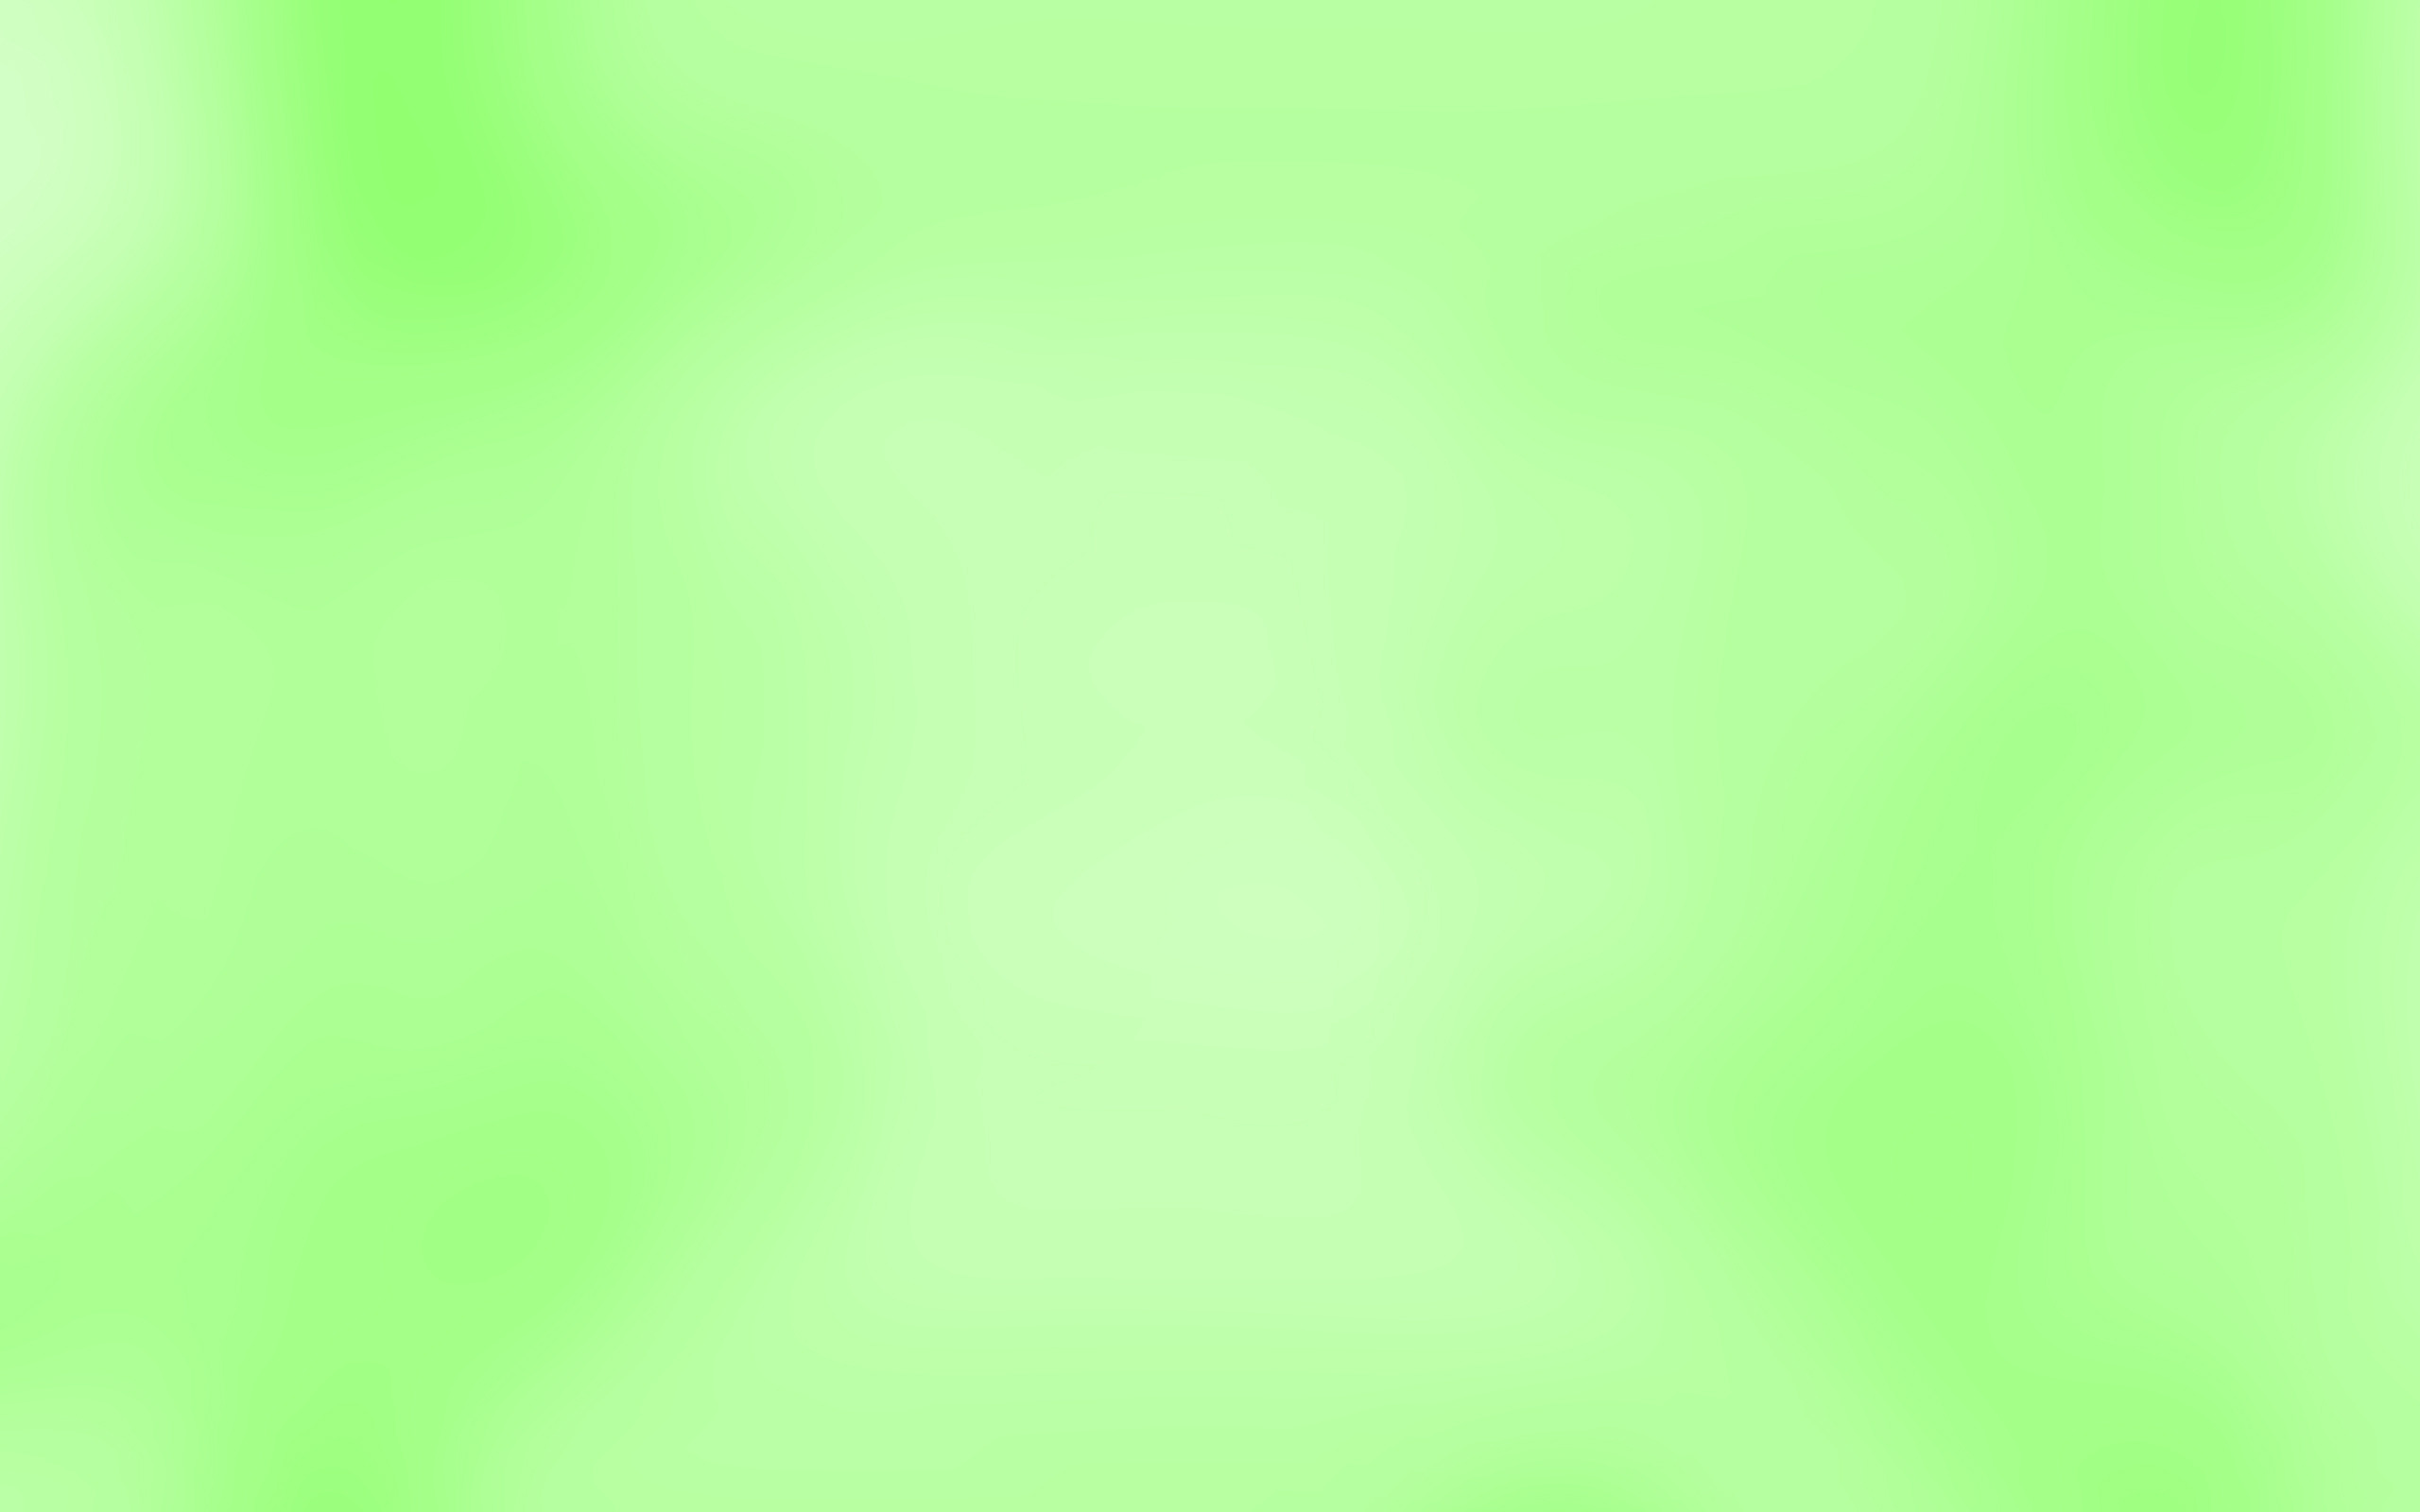 light green wallpaper wallpapersafari